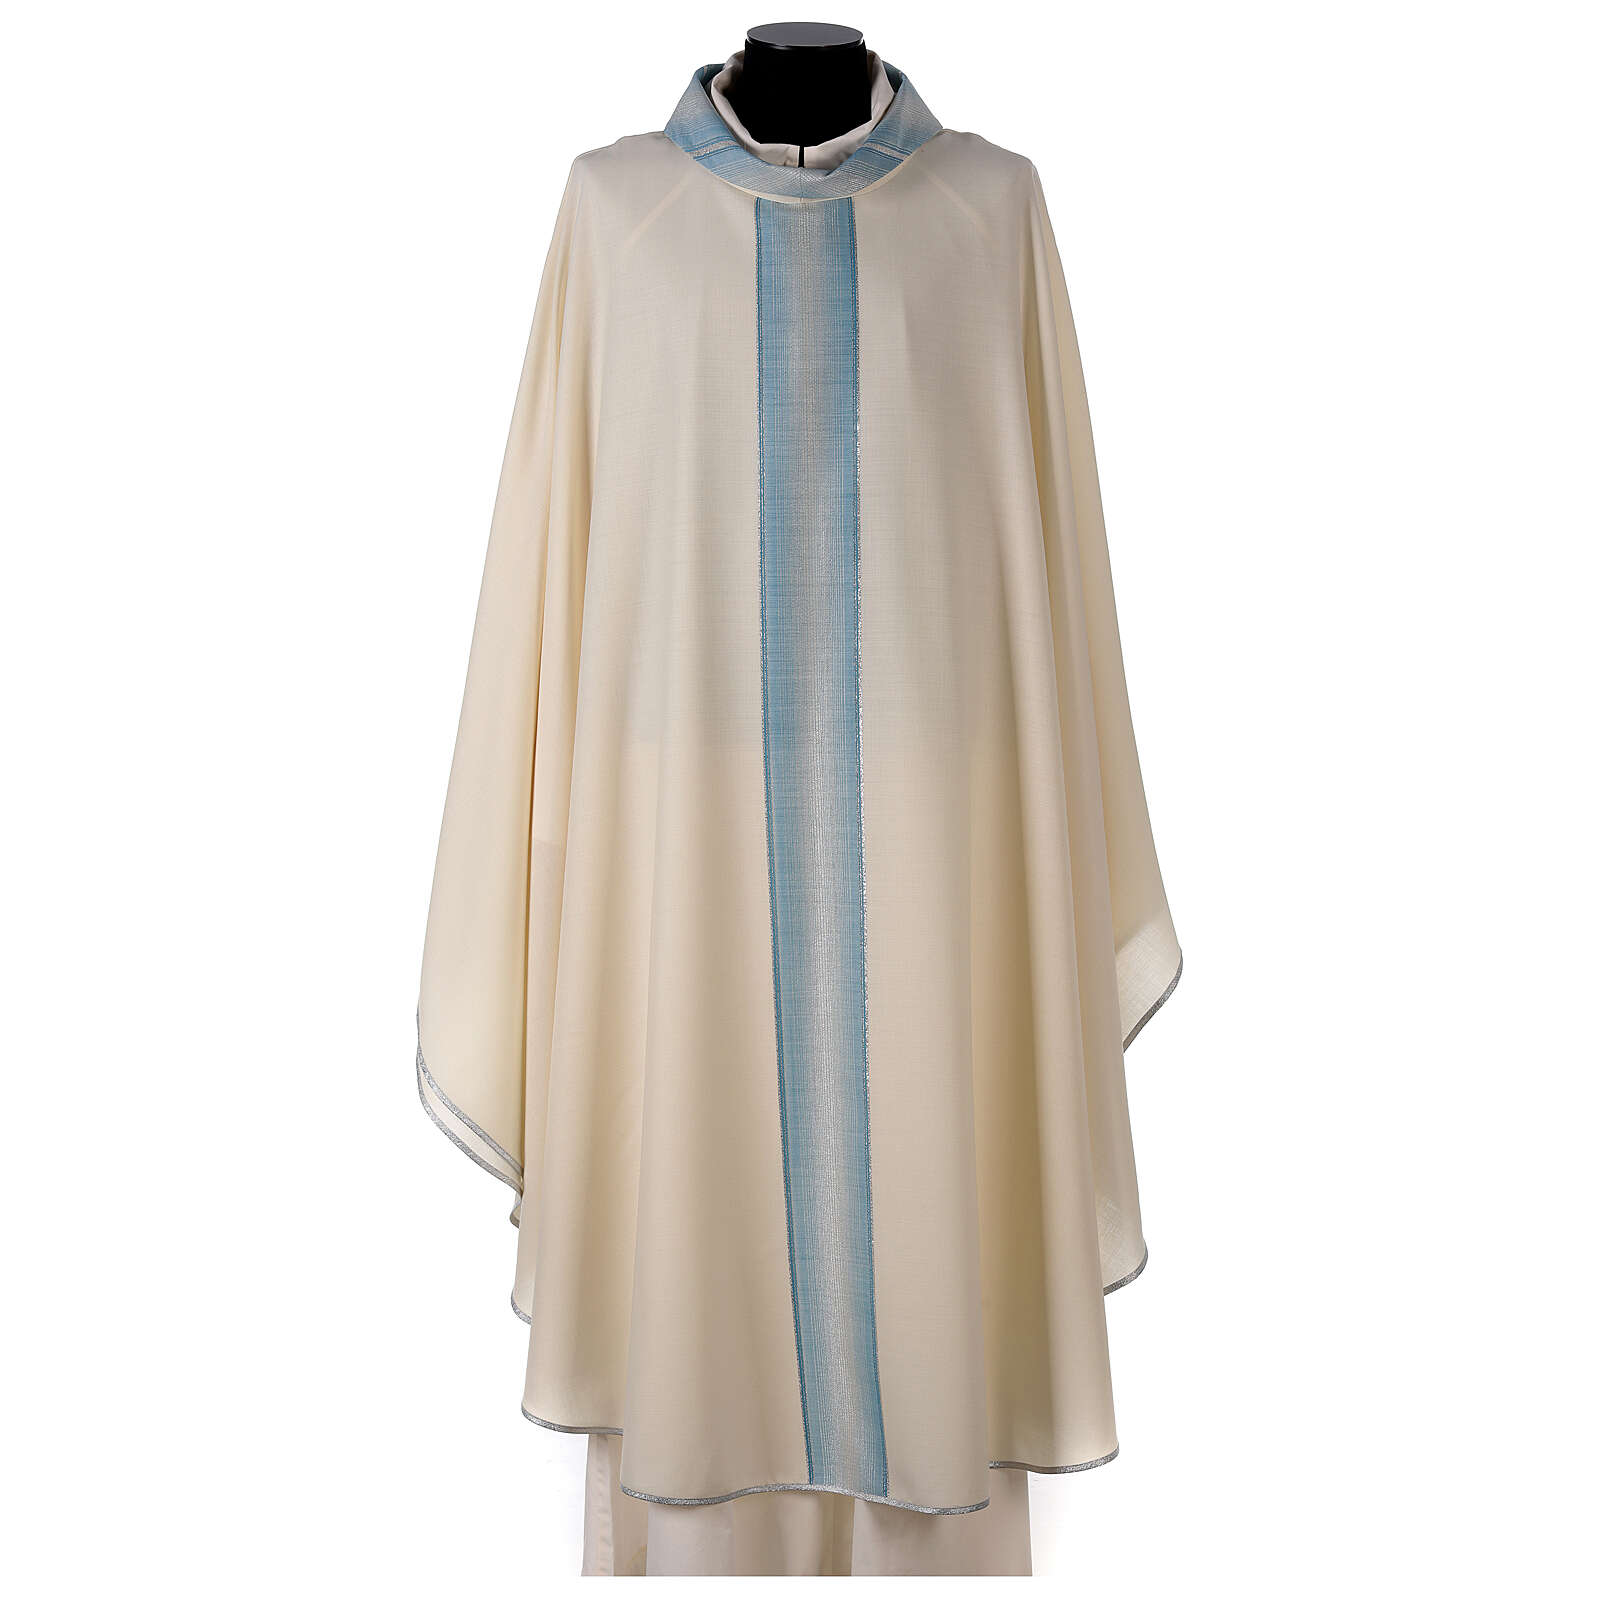 Casula Mariana striscia collo con righe 97% lana 3% lurex 4